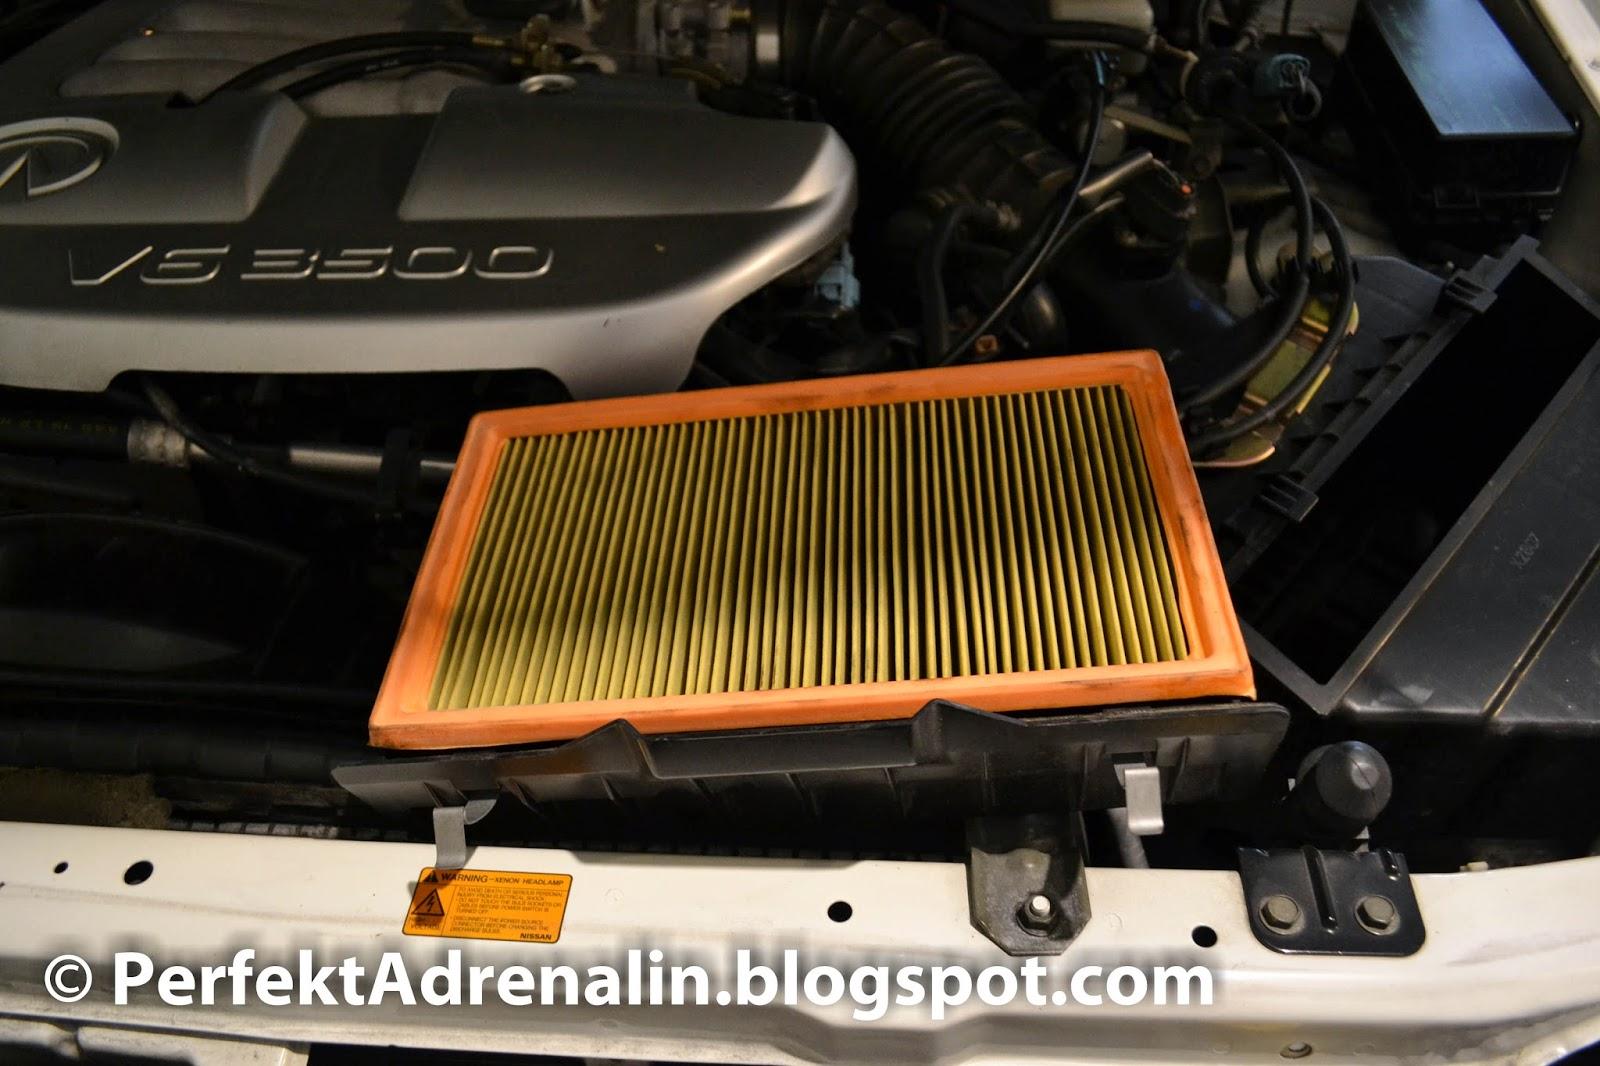 Perfektadrenalin diy infiniti qx4 pathfinder air filter 2001 2003 dirty air filter removed vanachro Image collections